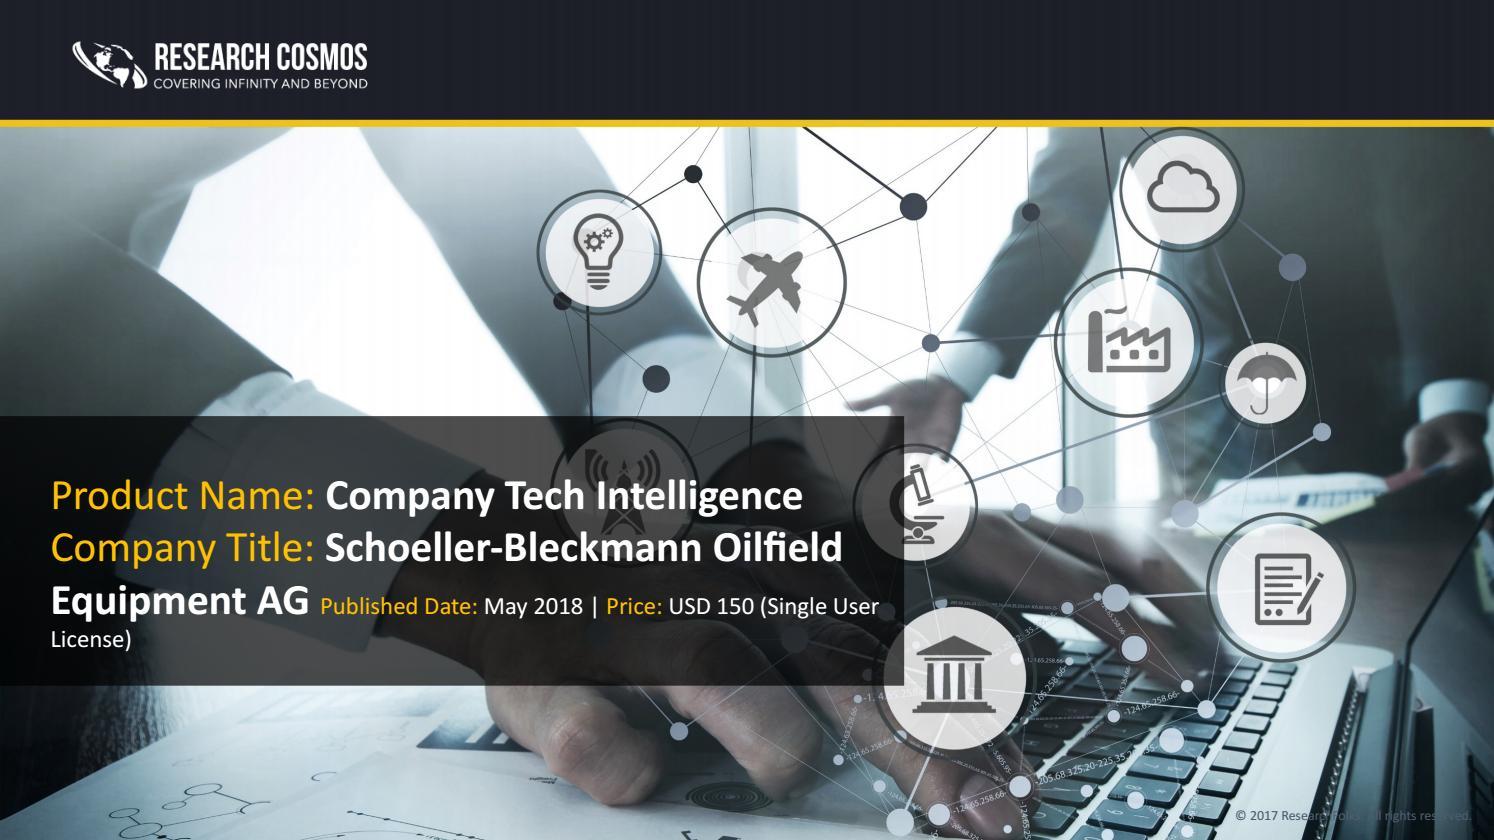 SCHOELLER-BLECKMANN OILFIELD EQUIPMENT AG Company Profile